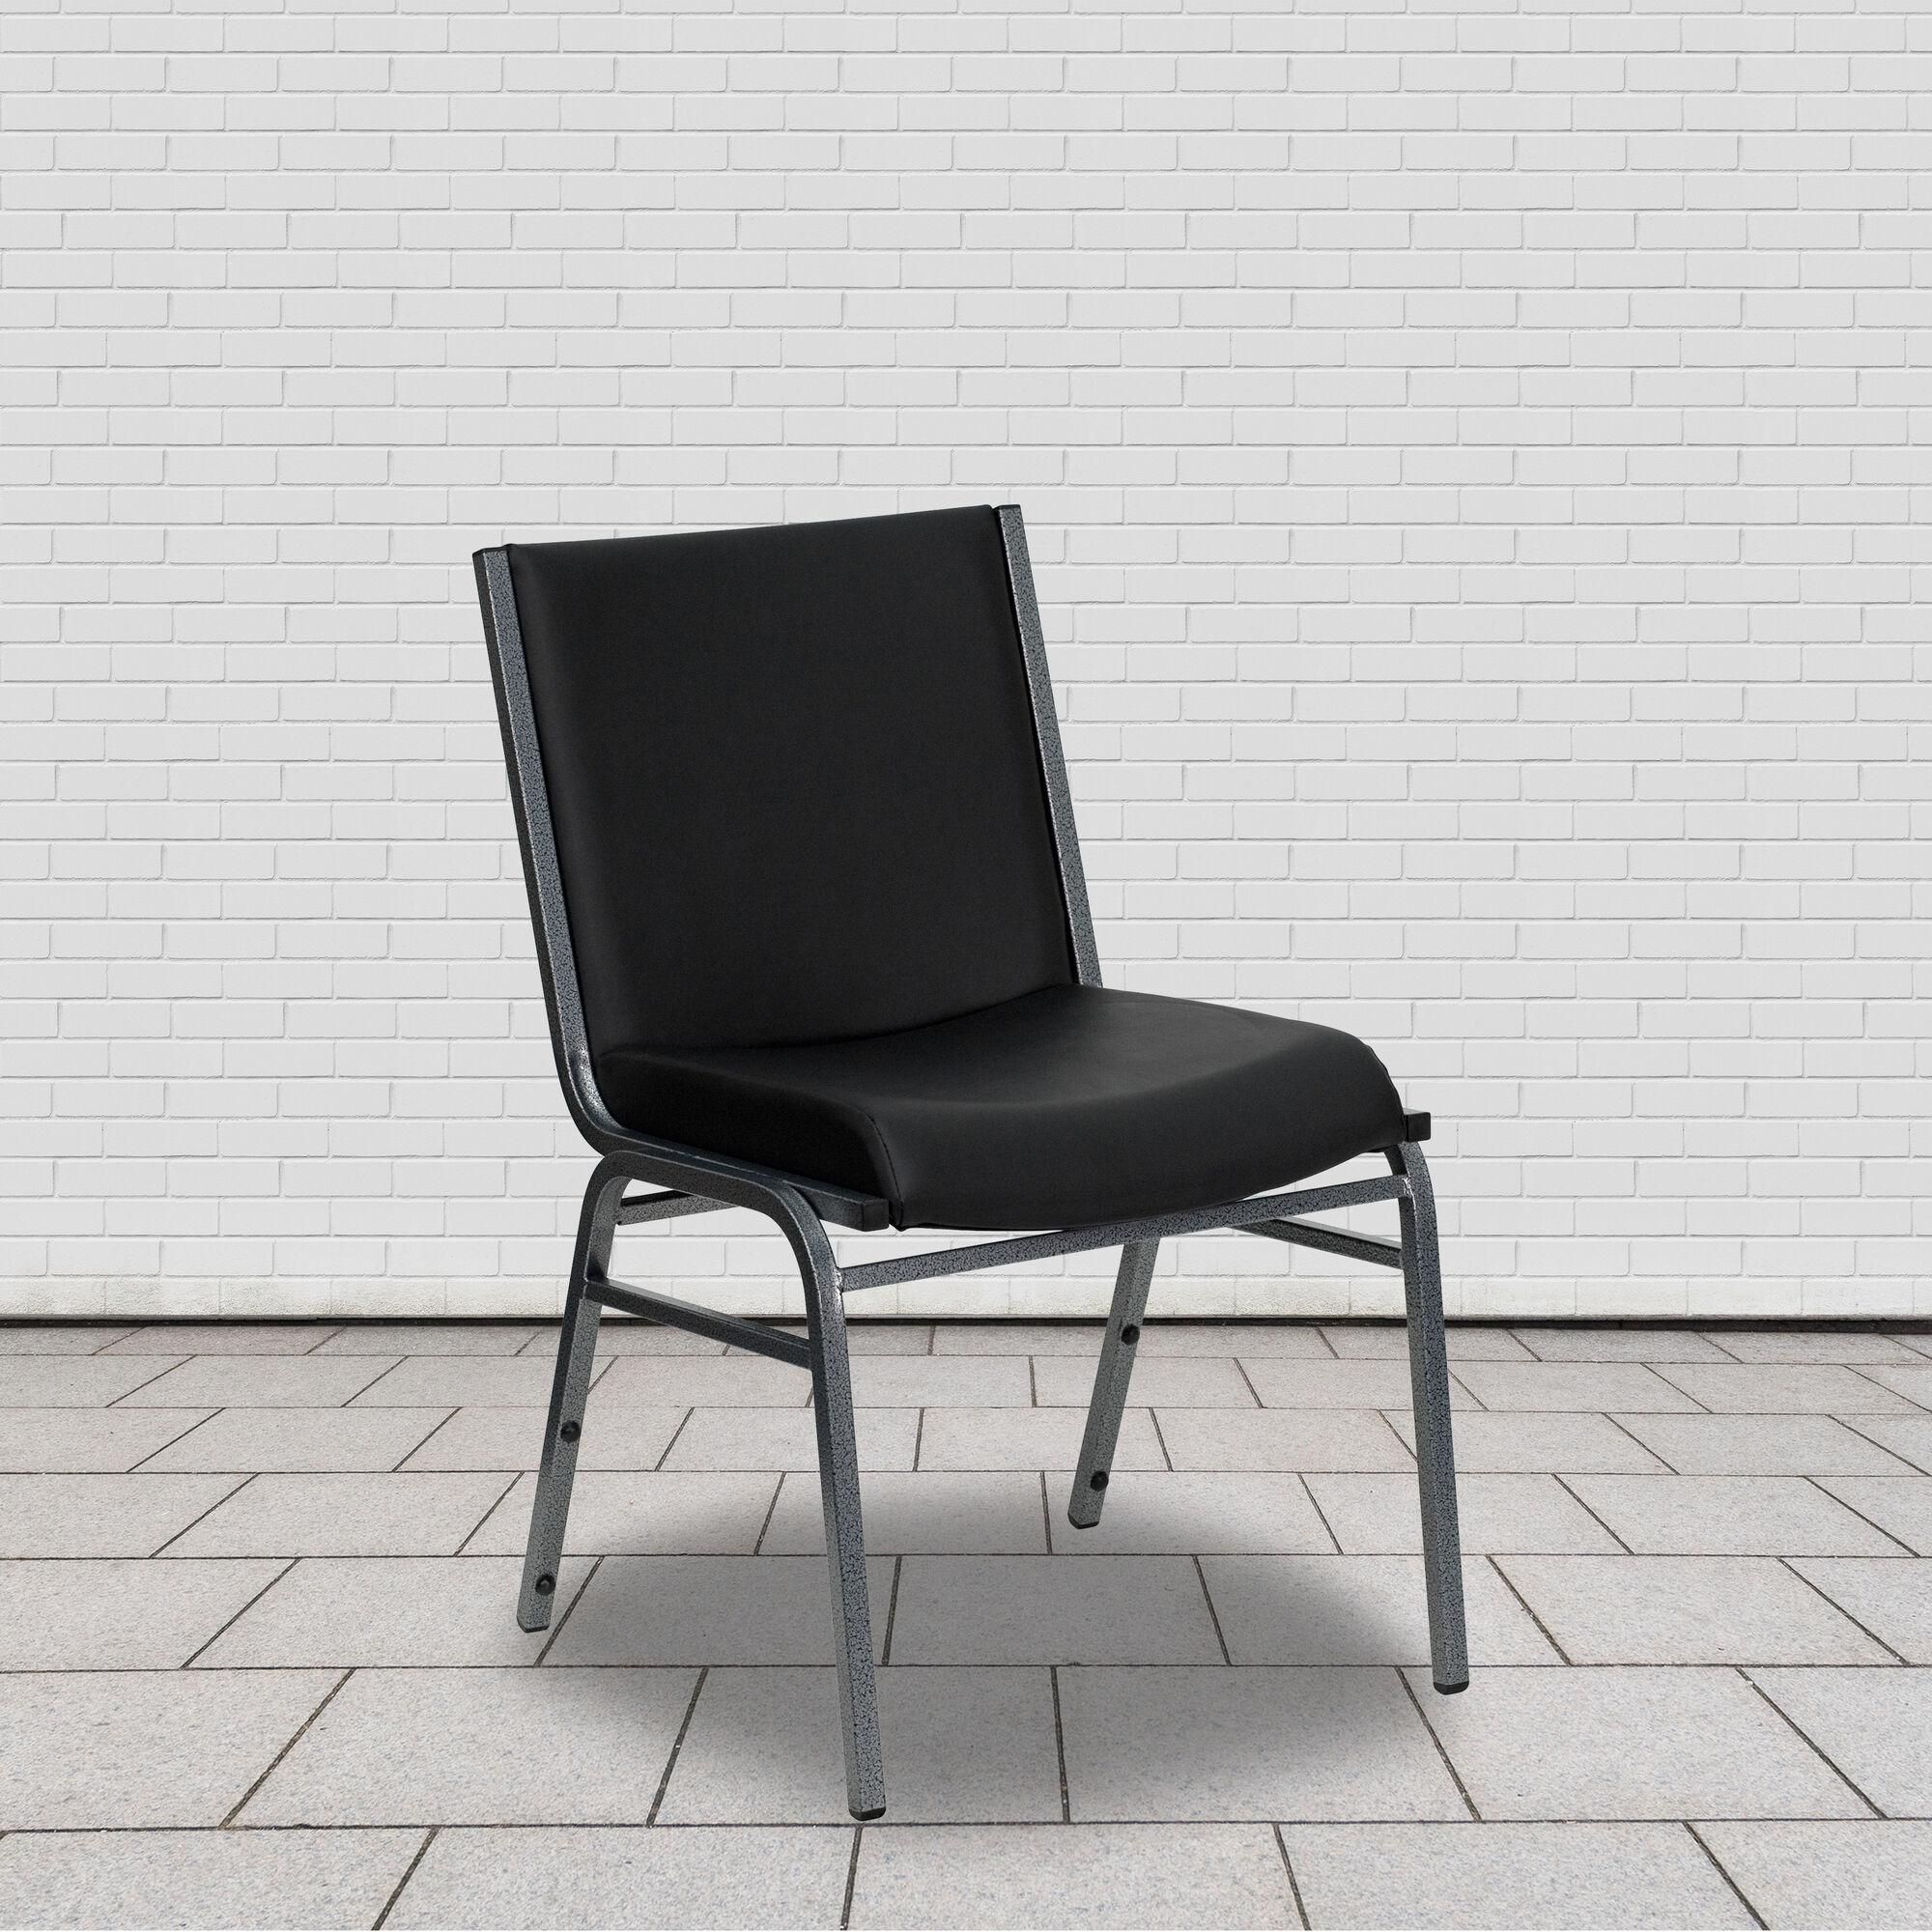 Black Vinyl Stack Chair Xu 60153 Bk Vyl Gg Bizchair Com